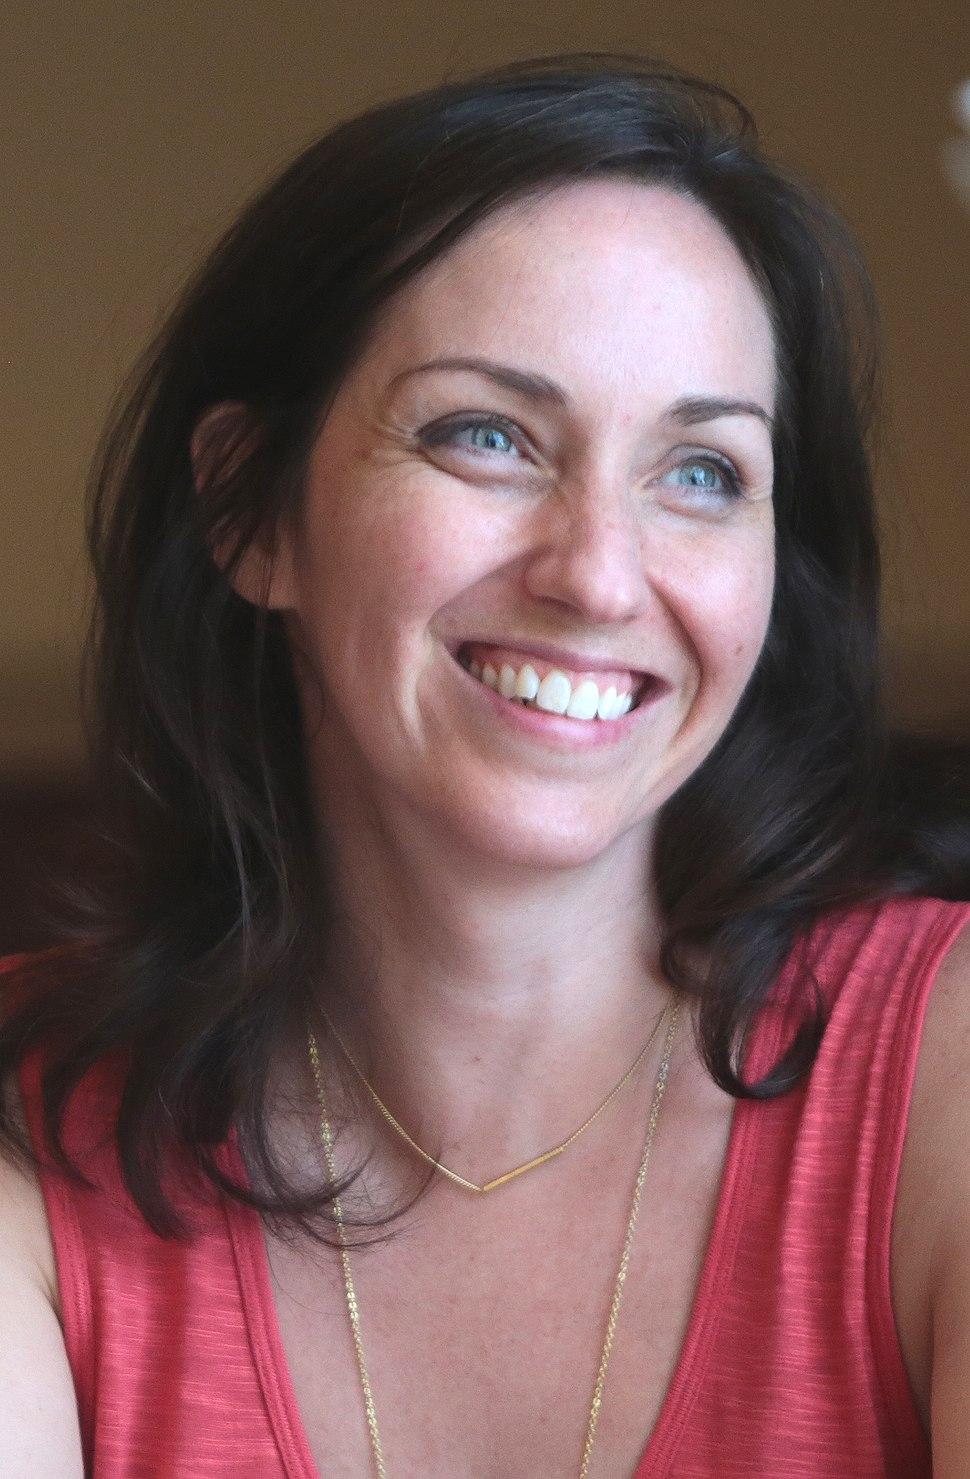 Carrie Keranen by Gage Skidmore